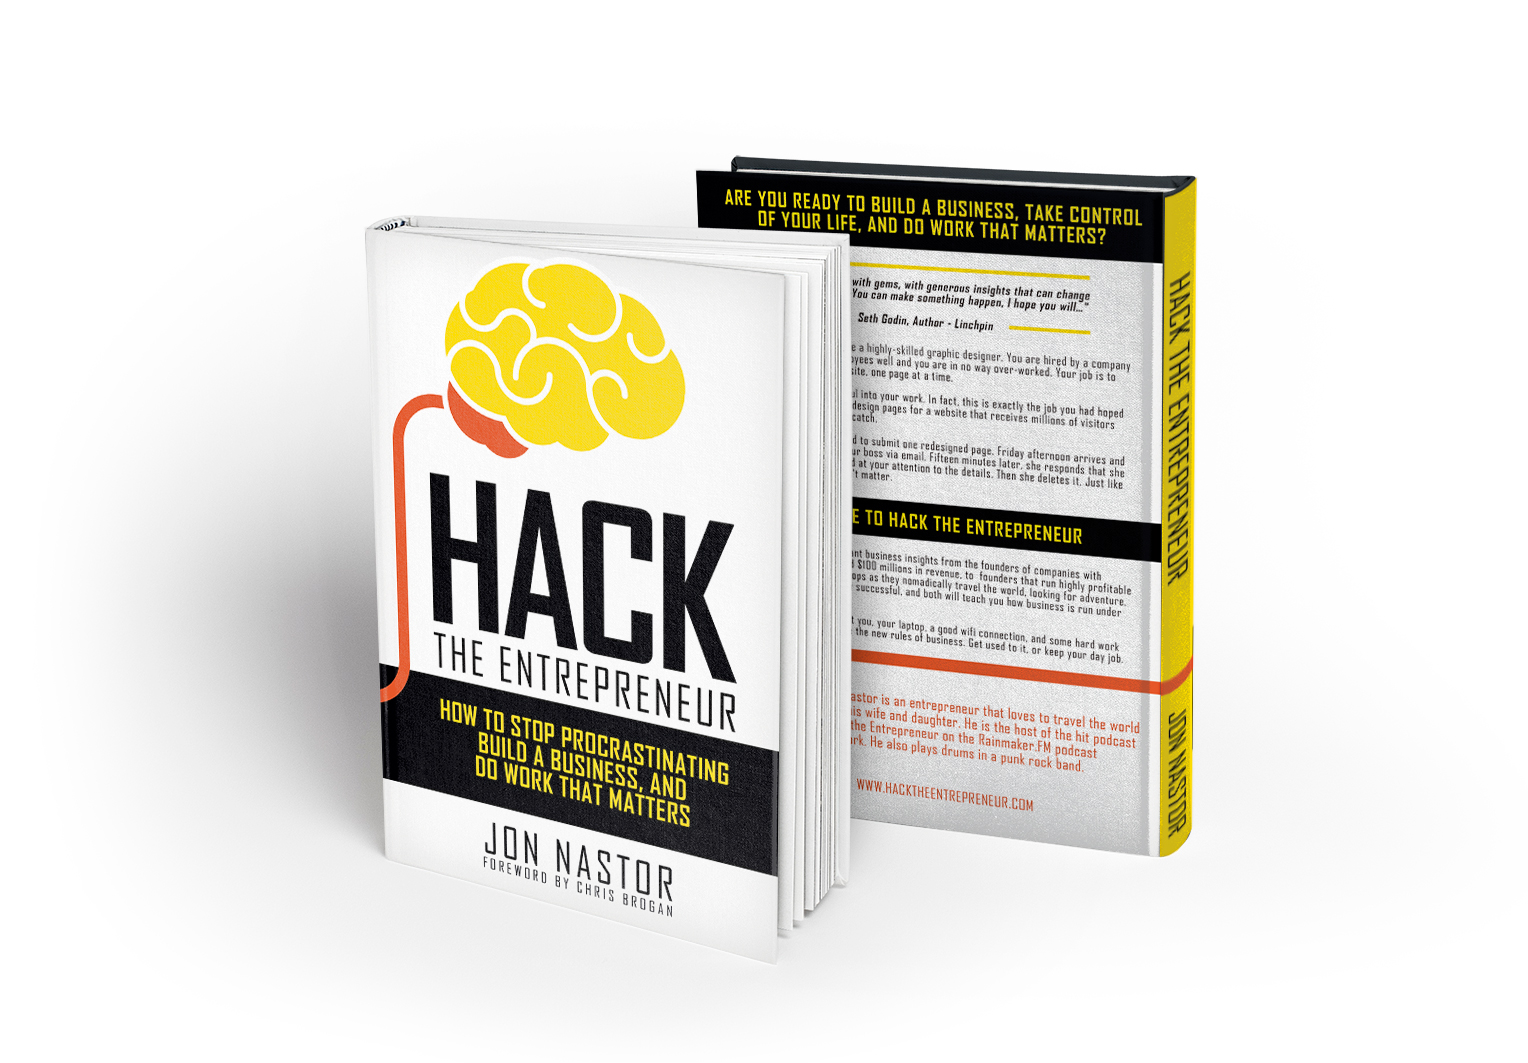 Hack the Entrepreneur: The Book